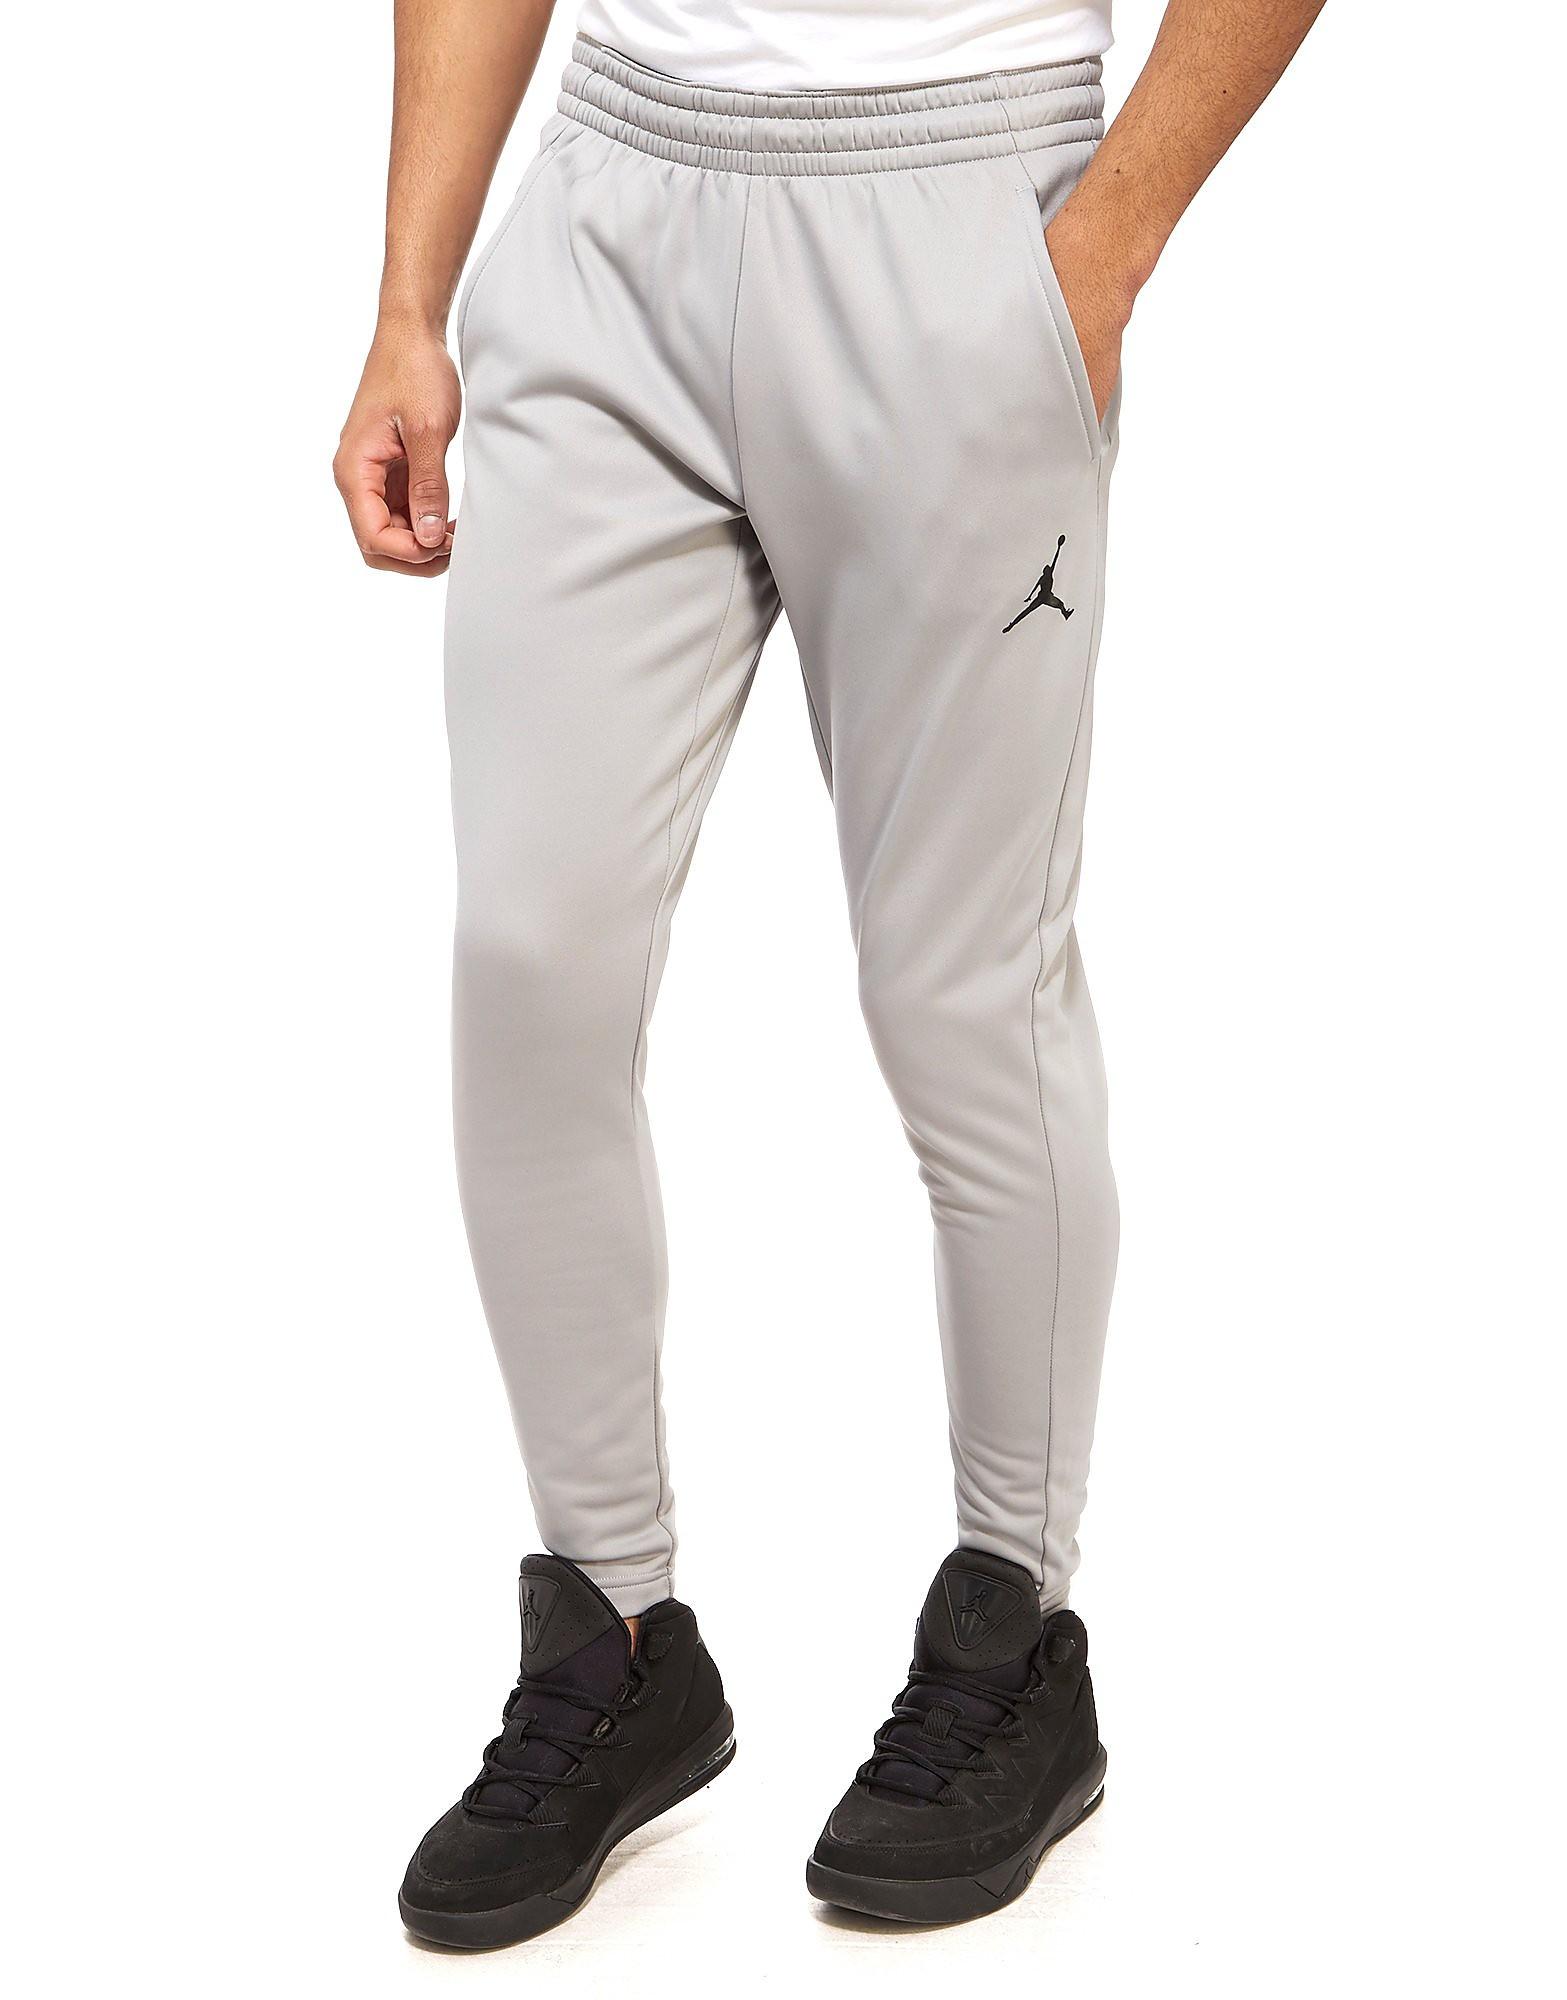 Jordan Therma 23 Alpha Pants